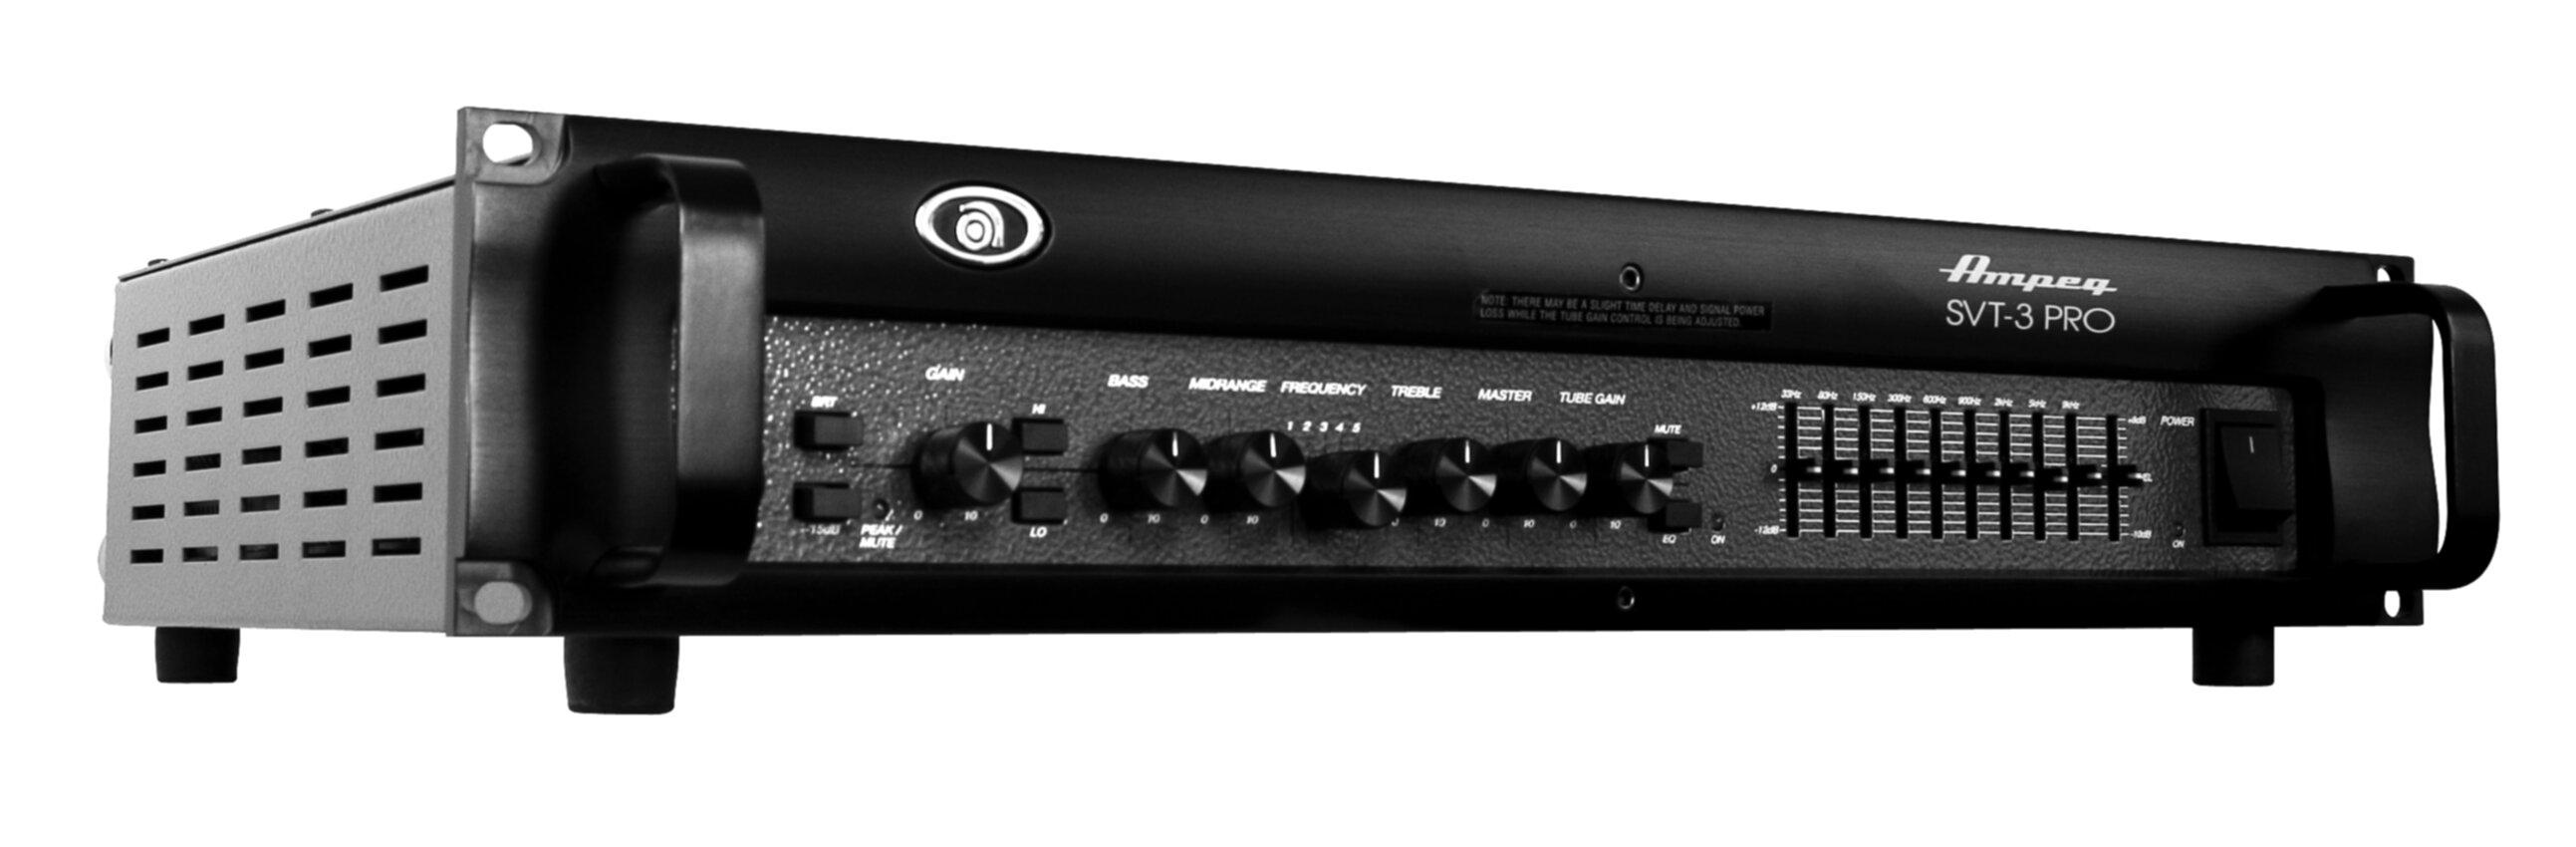 Ampeg Svt 3pro Preampli Basse A Lampes 1249 00 Guitare Piano